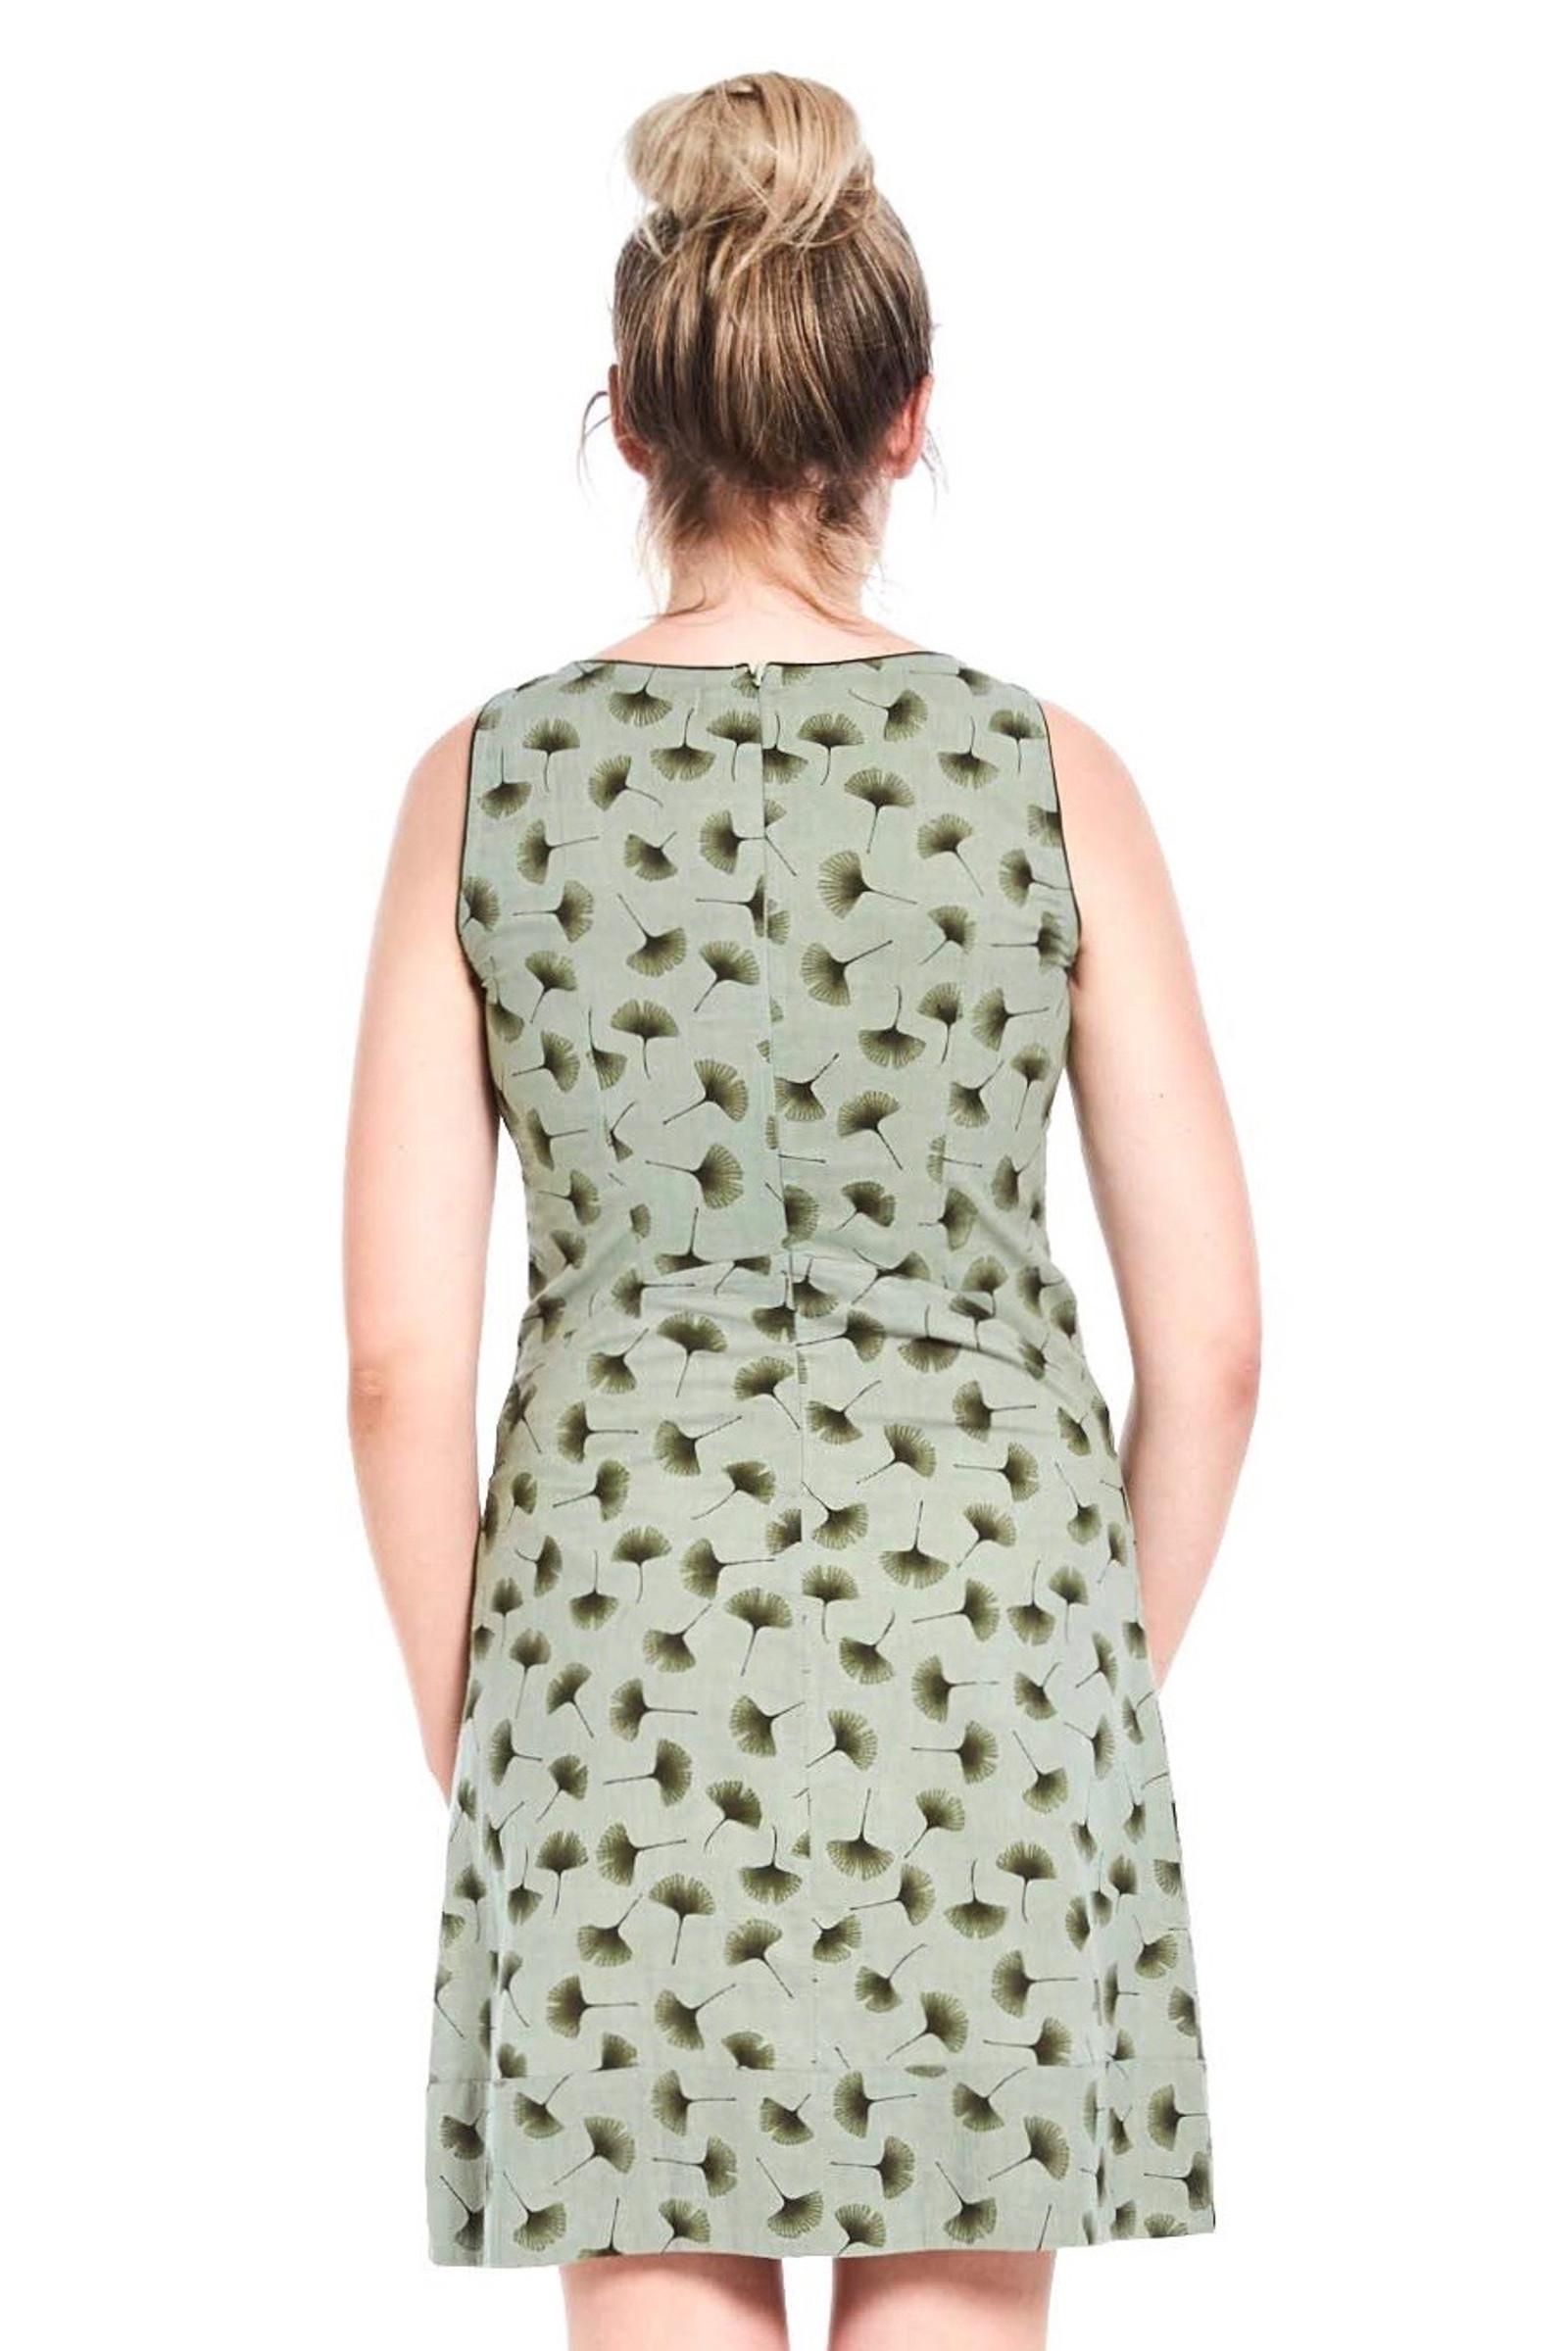 Alana Dress - Ginkgo Green